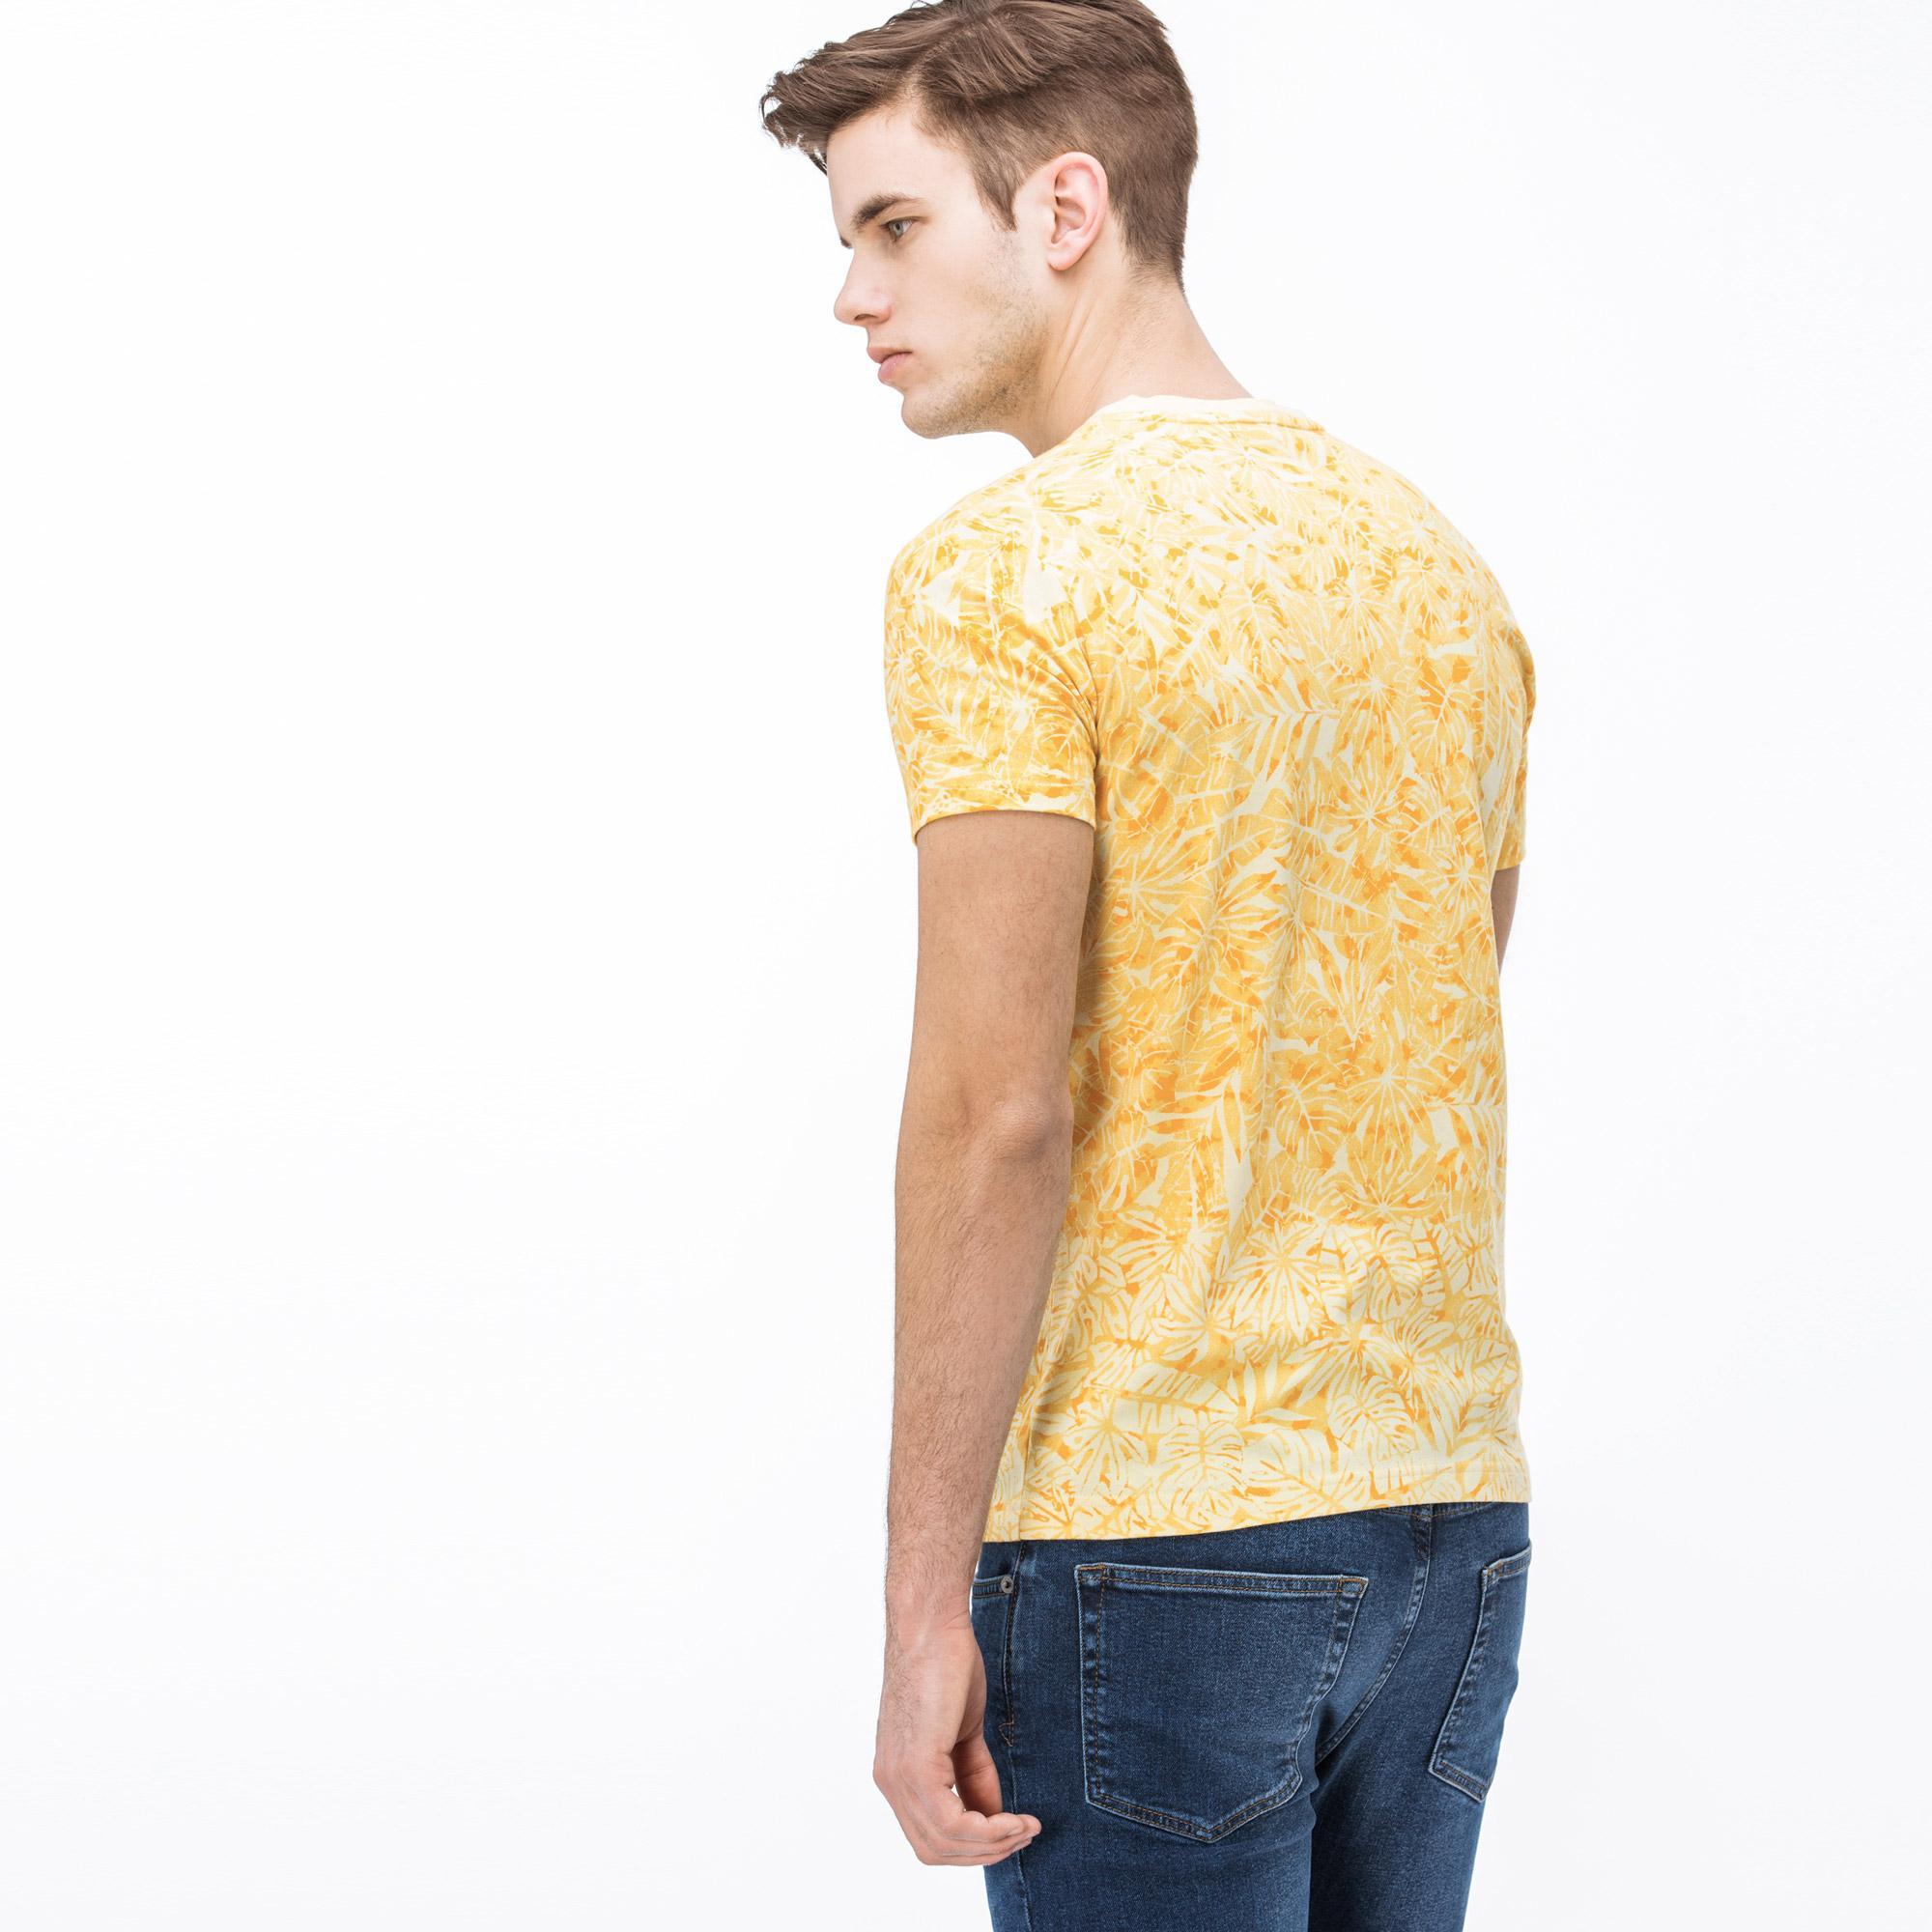 Lacoste Erkek V Yaka Desenli Sarı T-Shirt